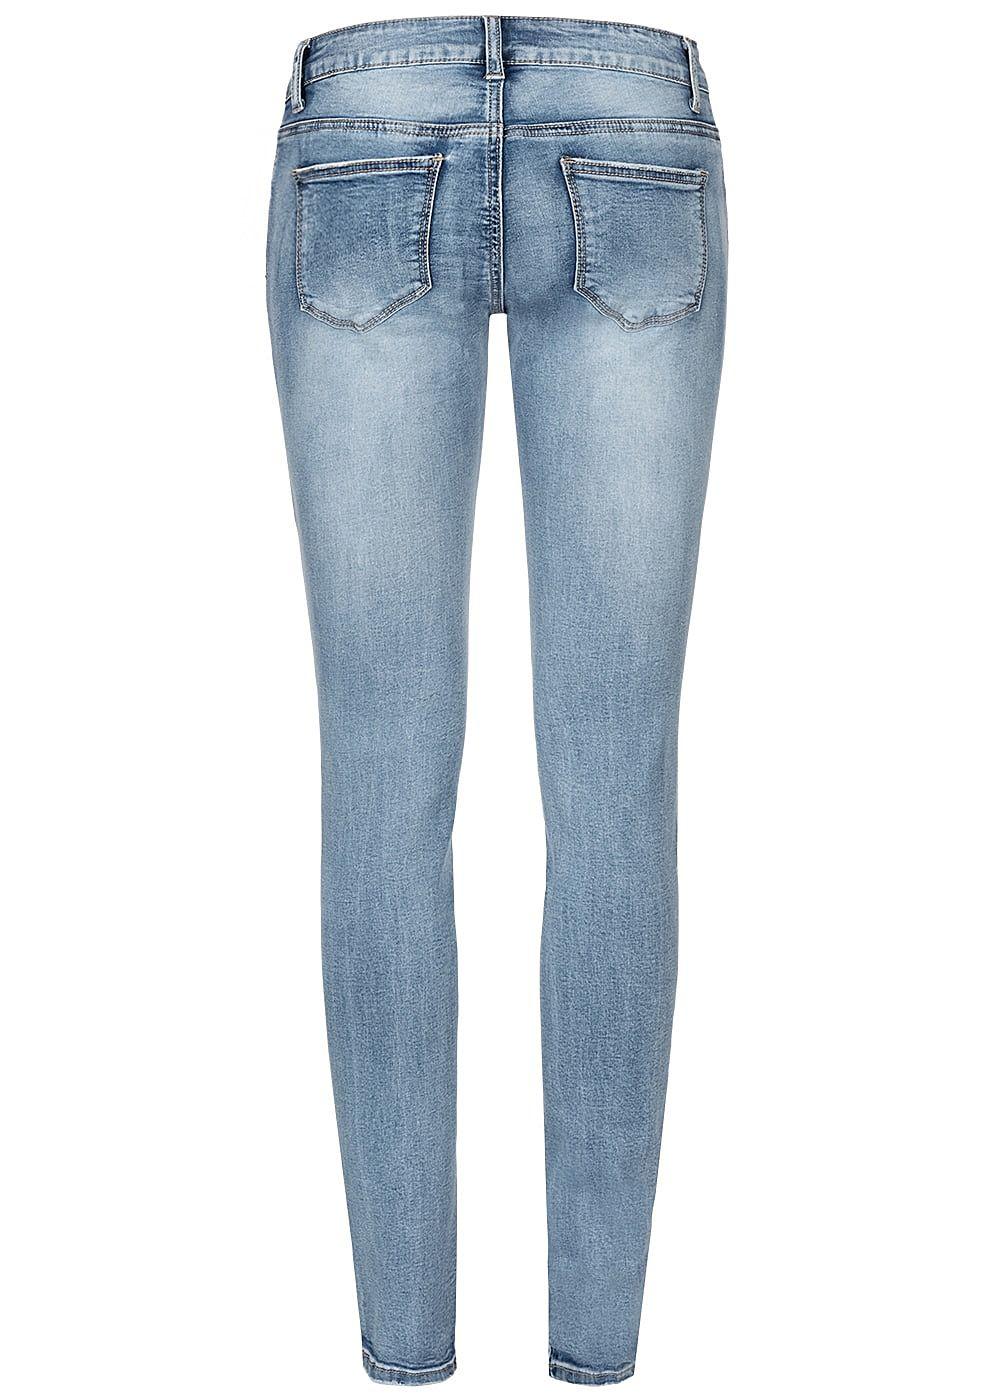 Seventyseven Lifestyle Damen Skinny Jeans 5 Pockets Heavy Destroy Look med blau denim